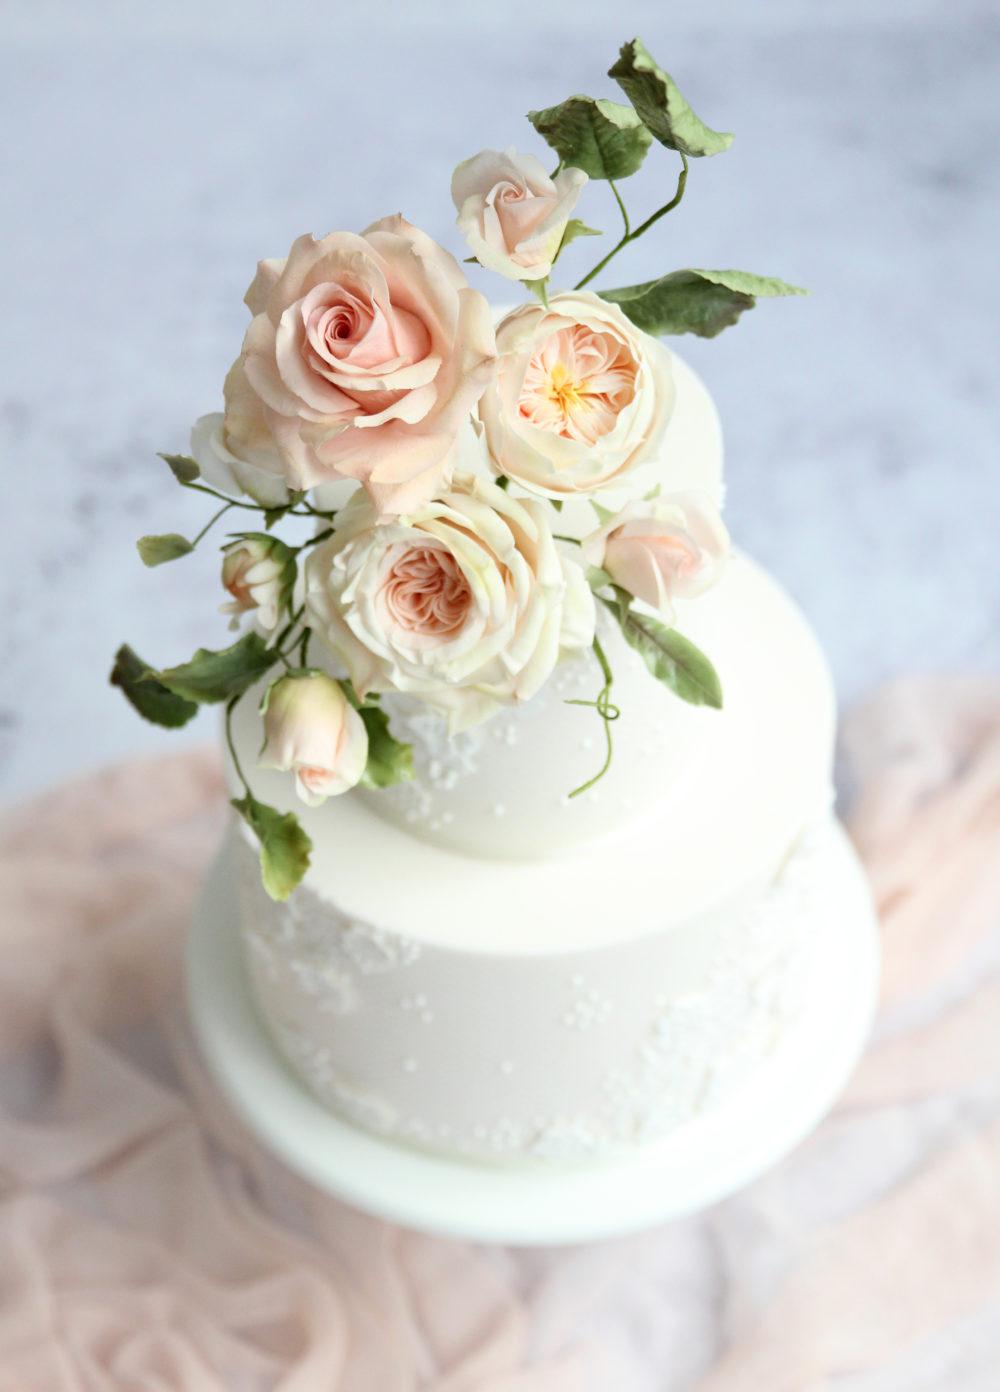 Blush Sugar Flowers Cake Cove Cake Design